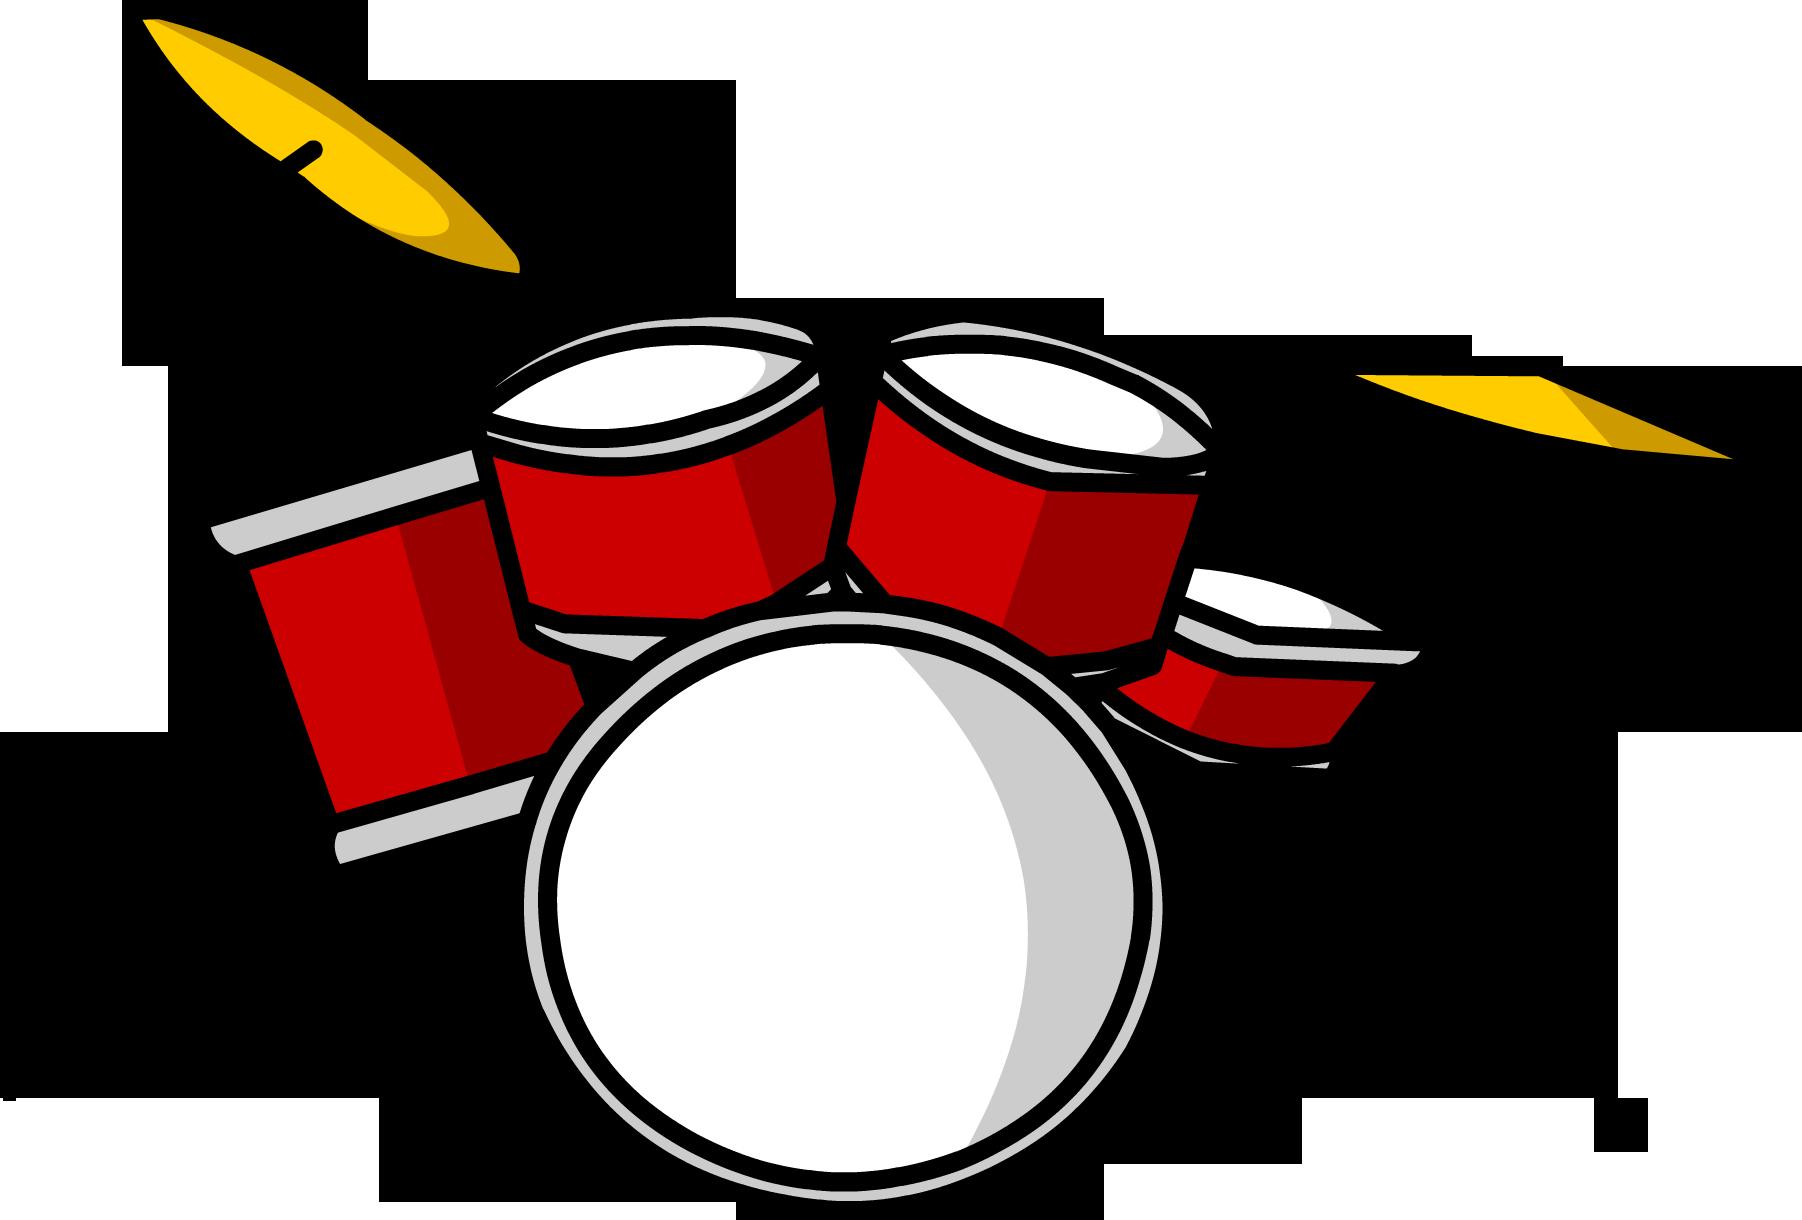 Drum PNG - 15139